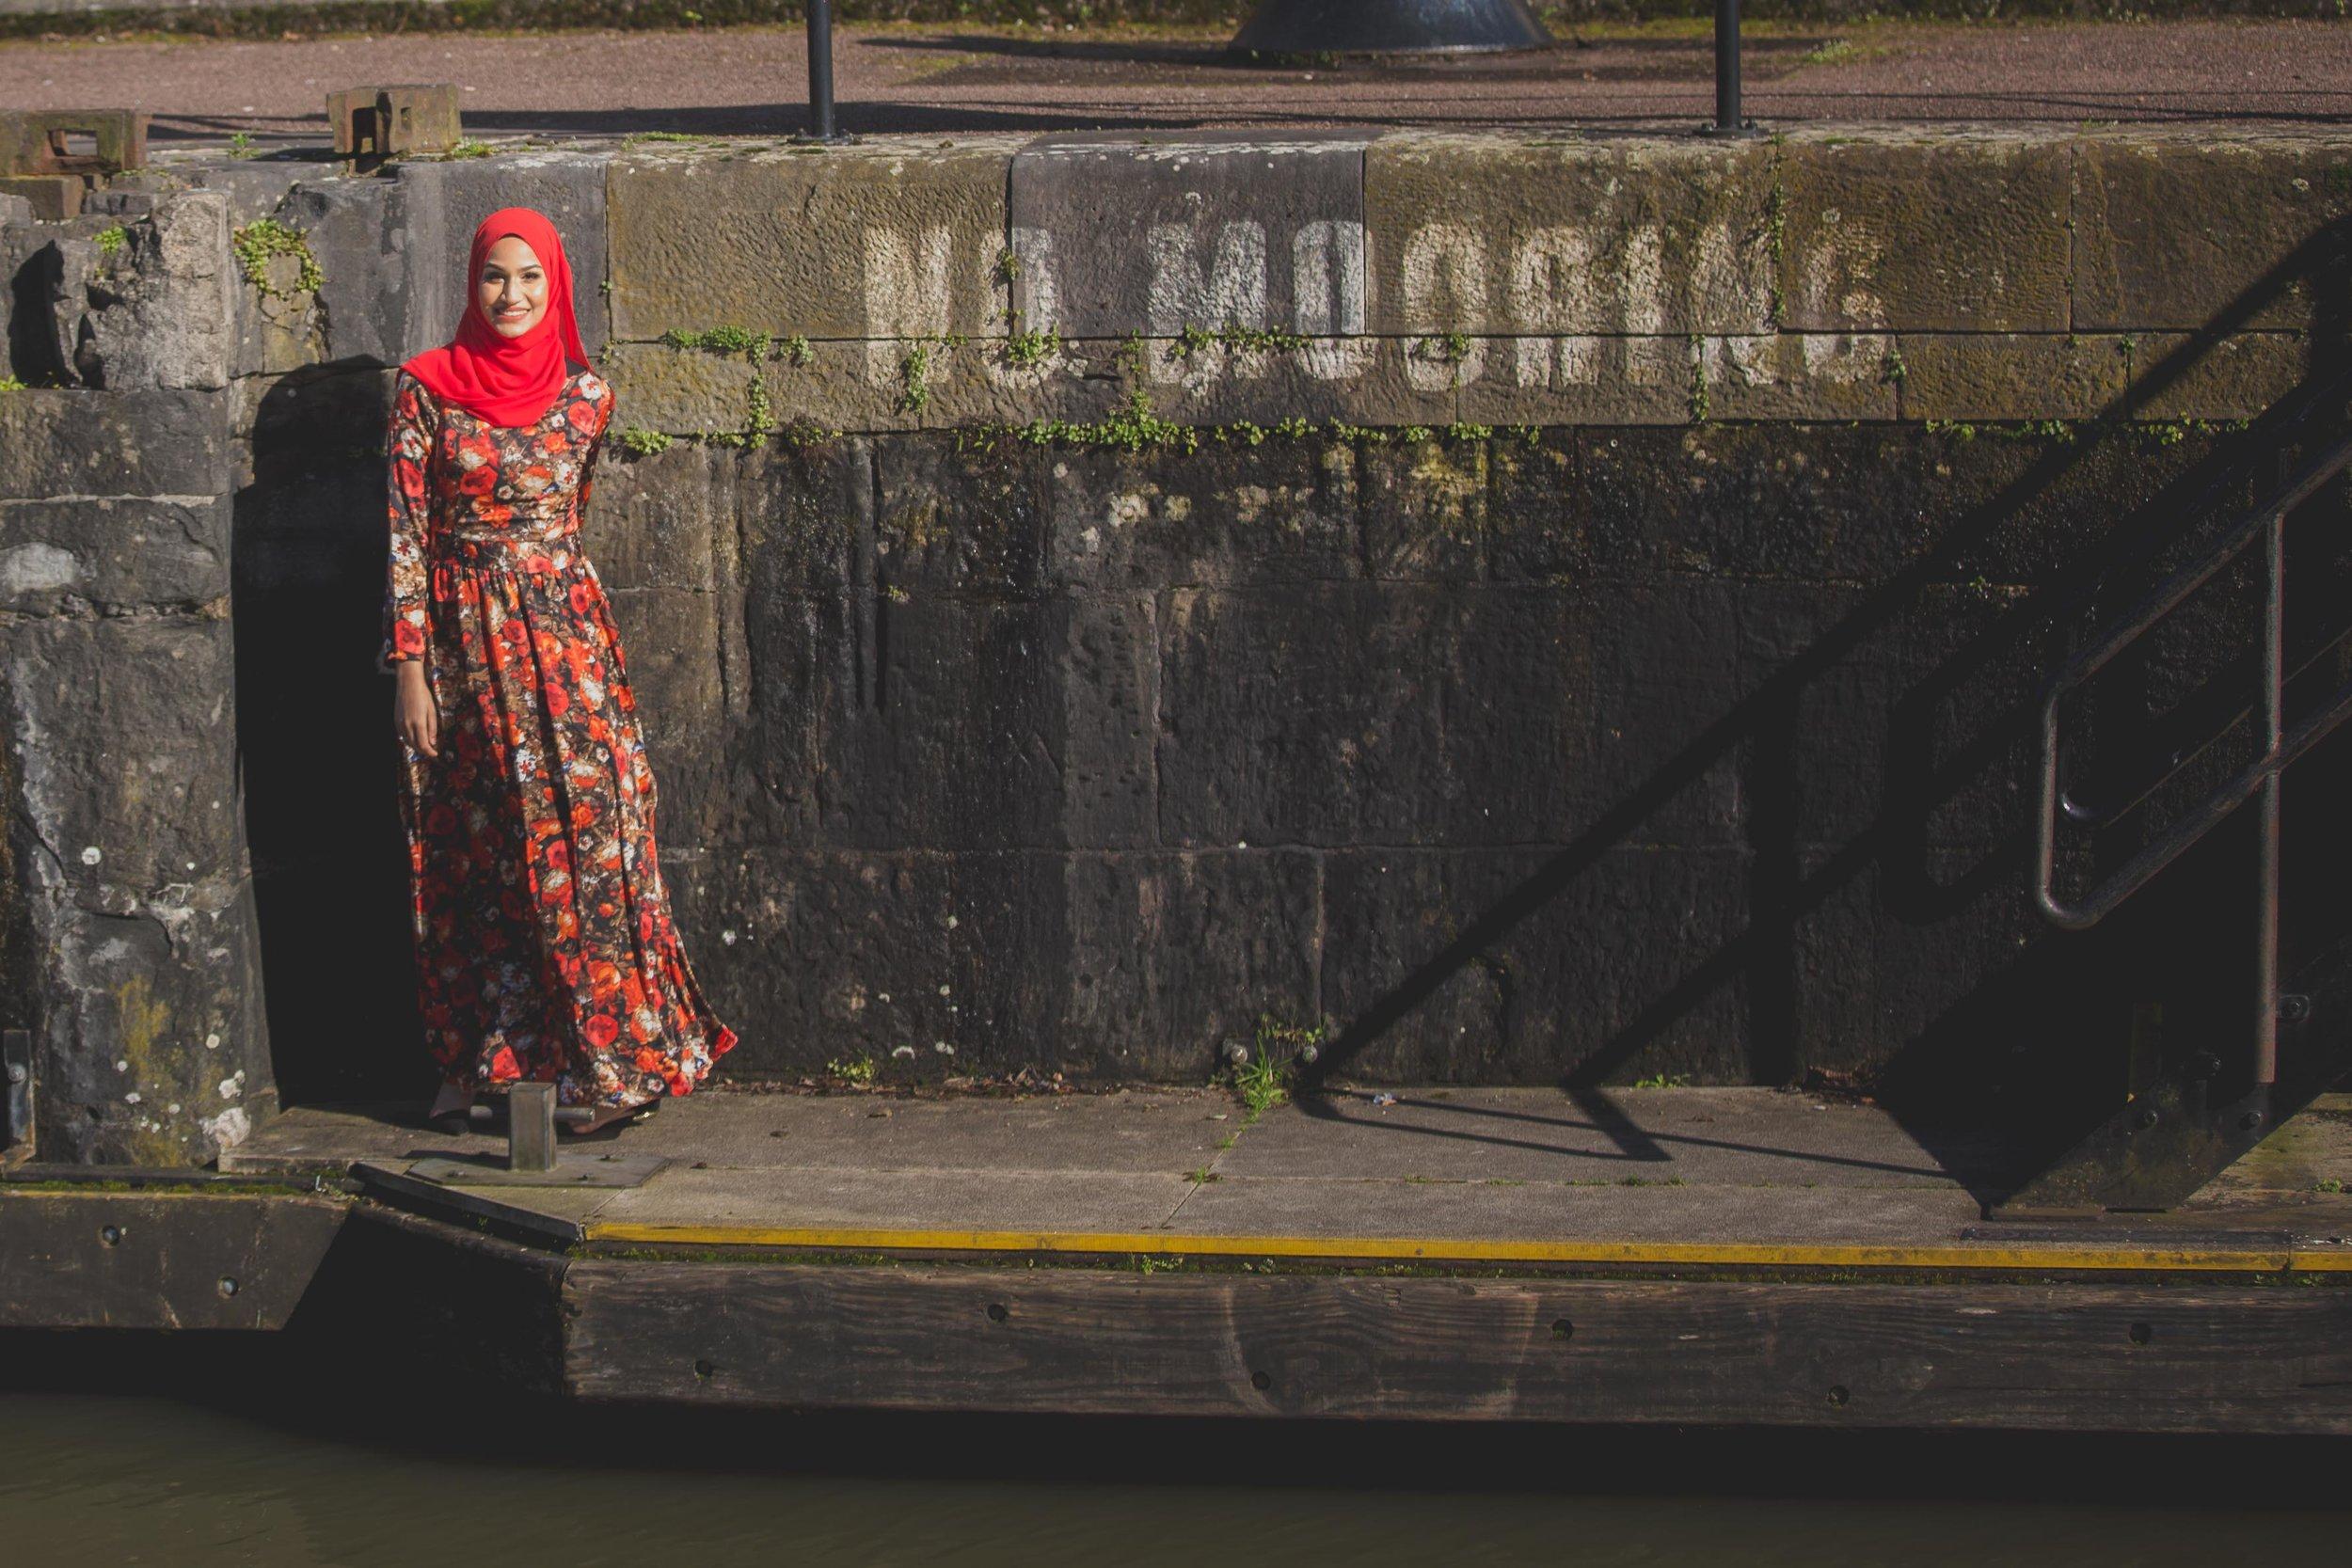 modest-street-aisha-rahman-fashion-photography-london-bristol-natalia-smith-photography-10.jpg